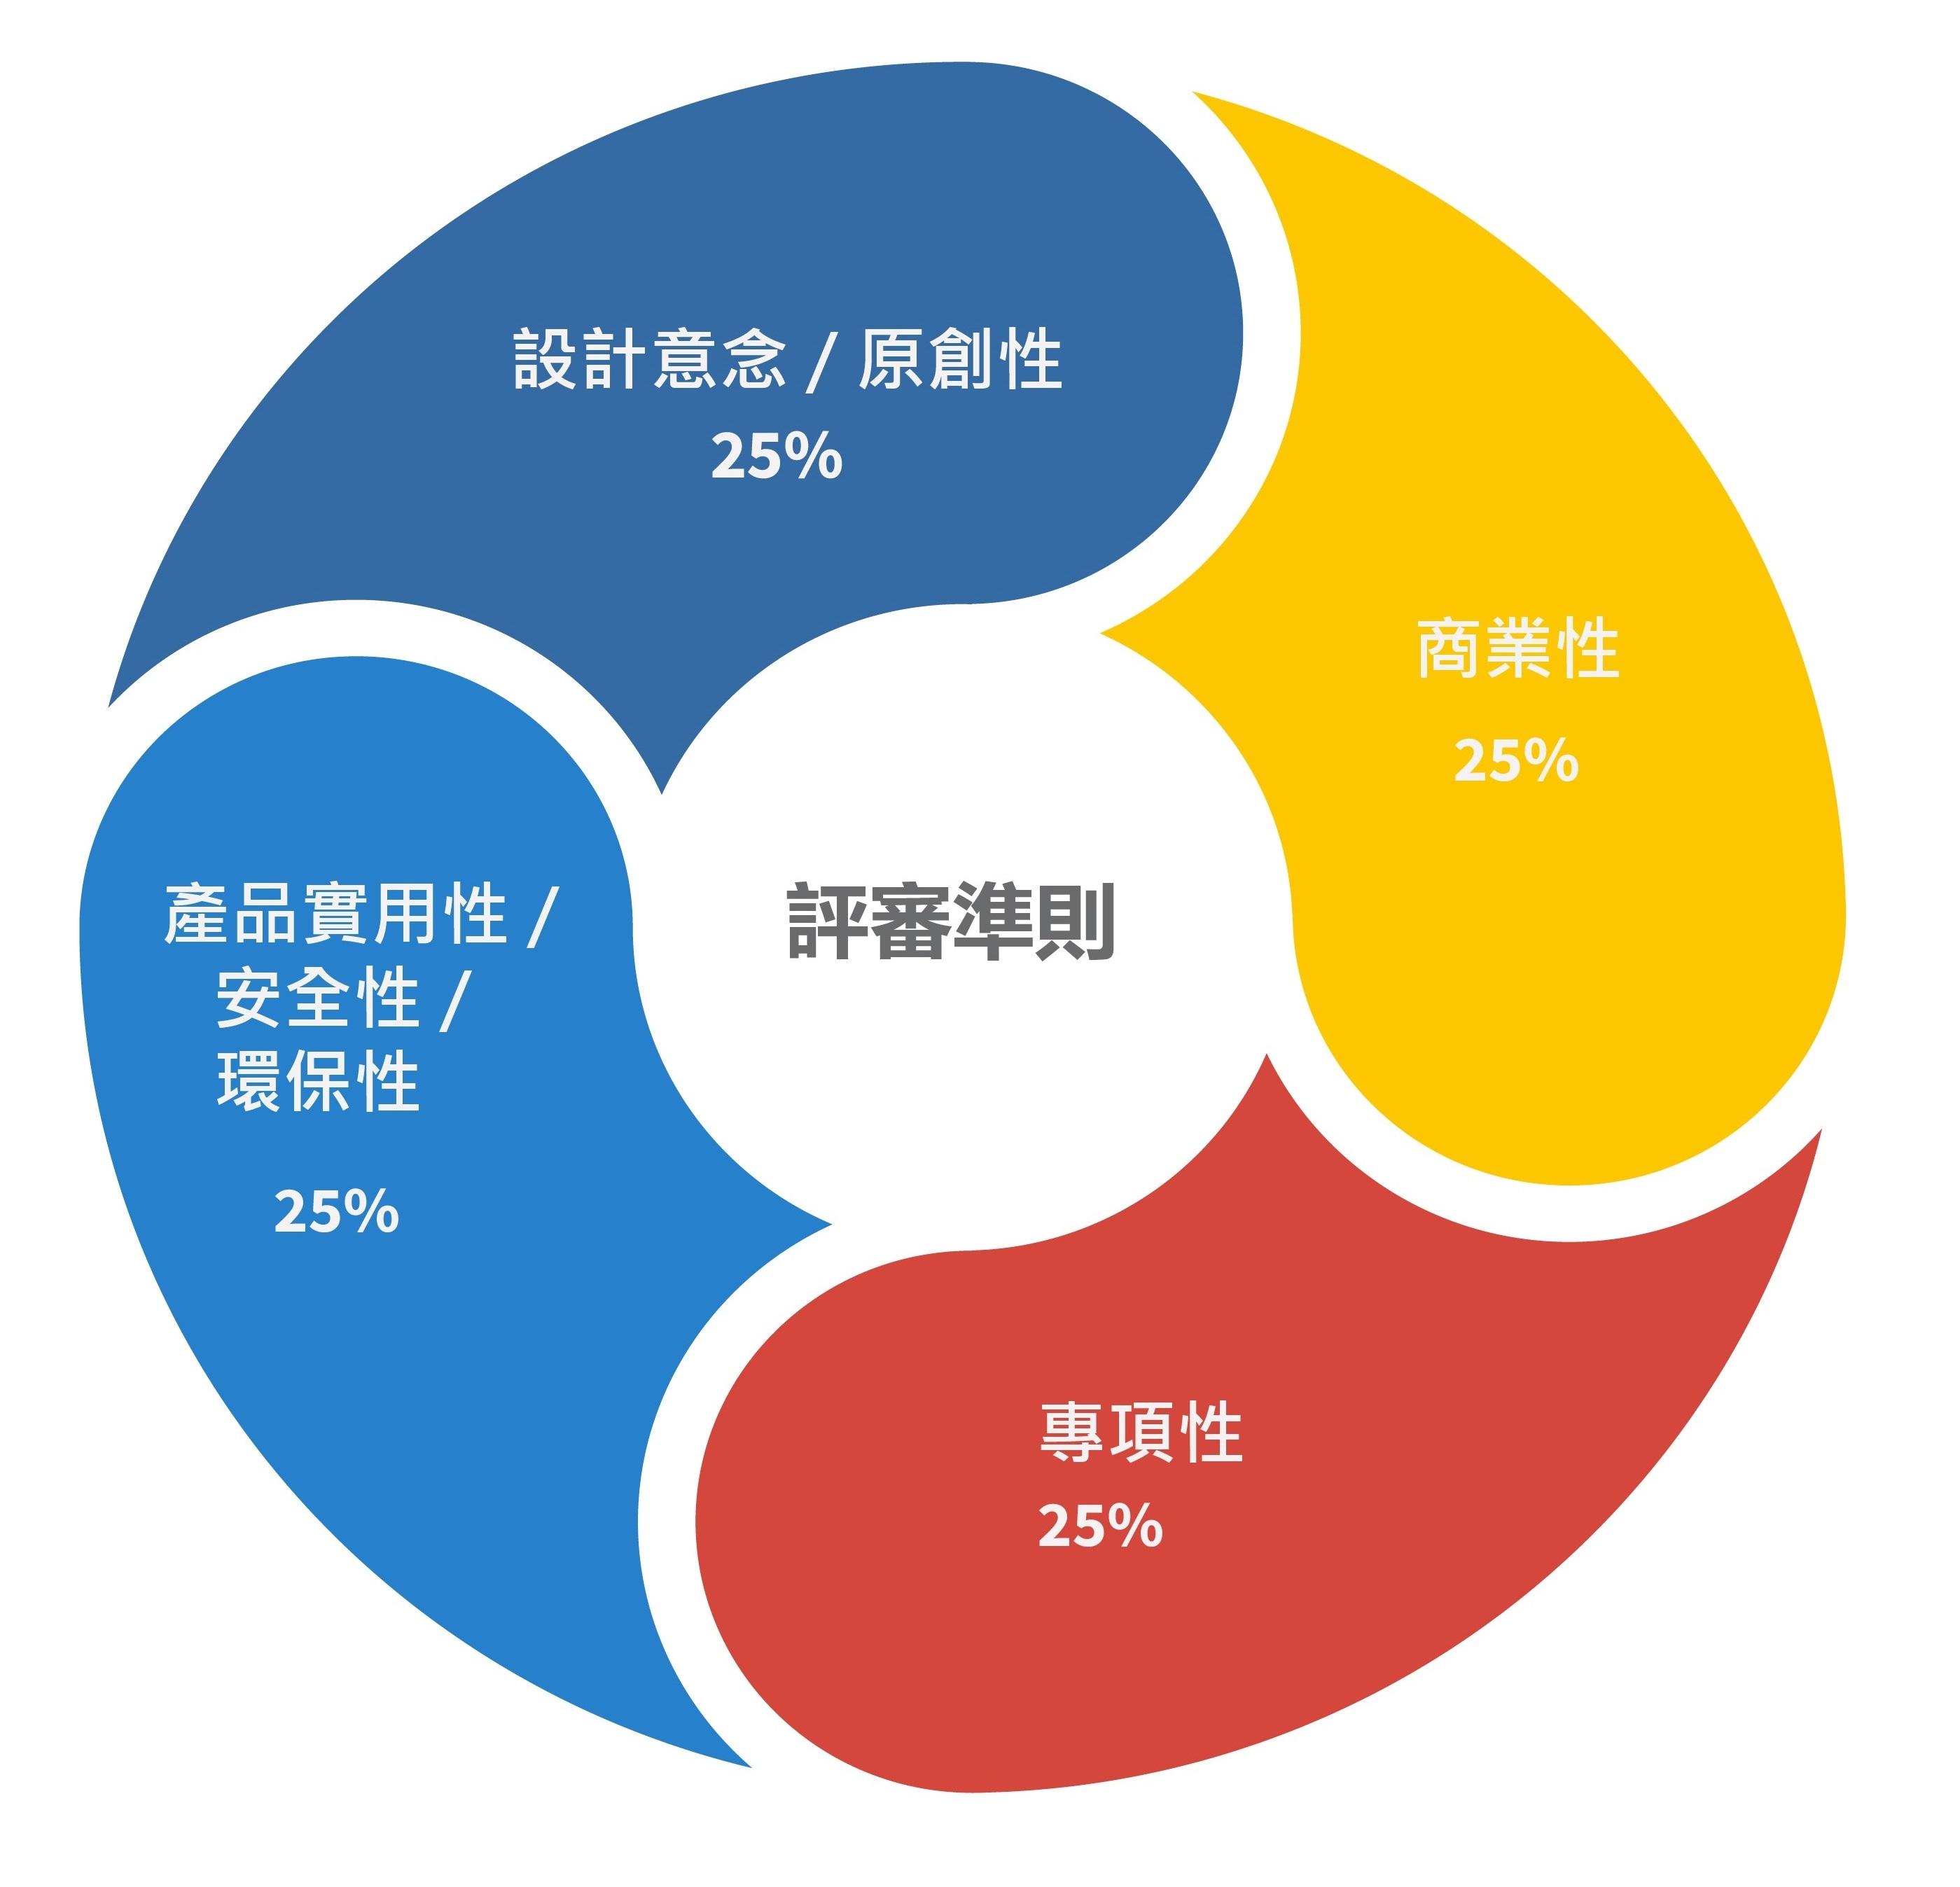 評審準則 FINAL - Hong Kong Toys Council